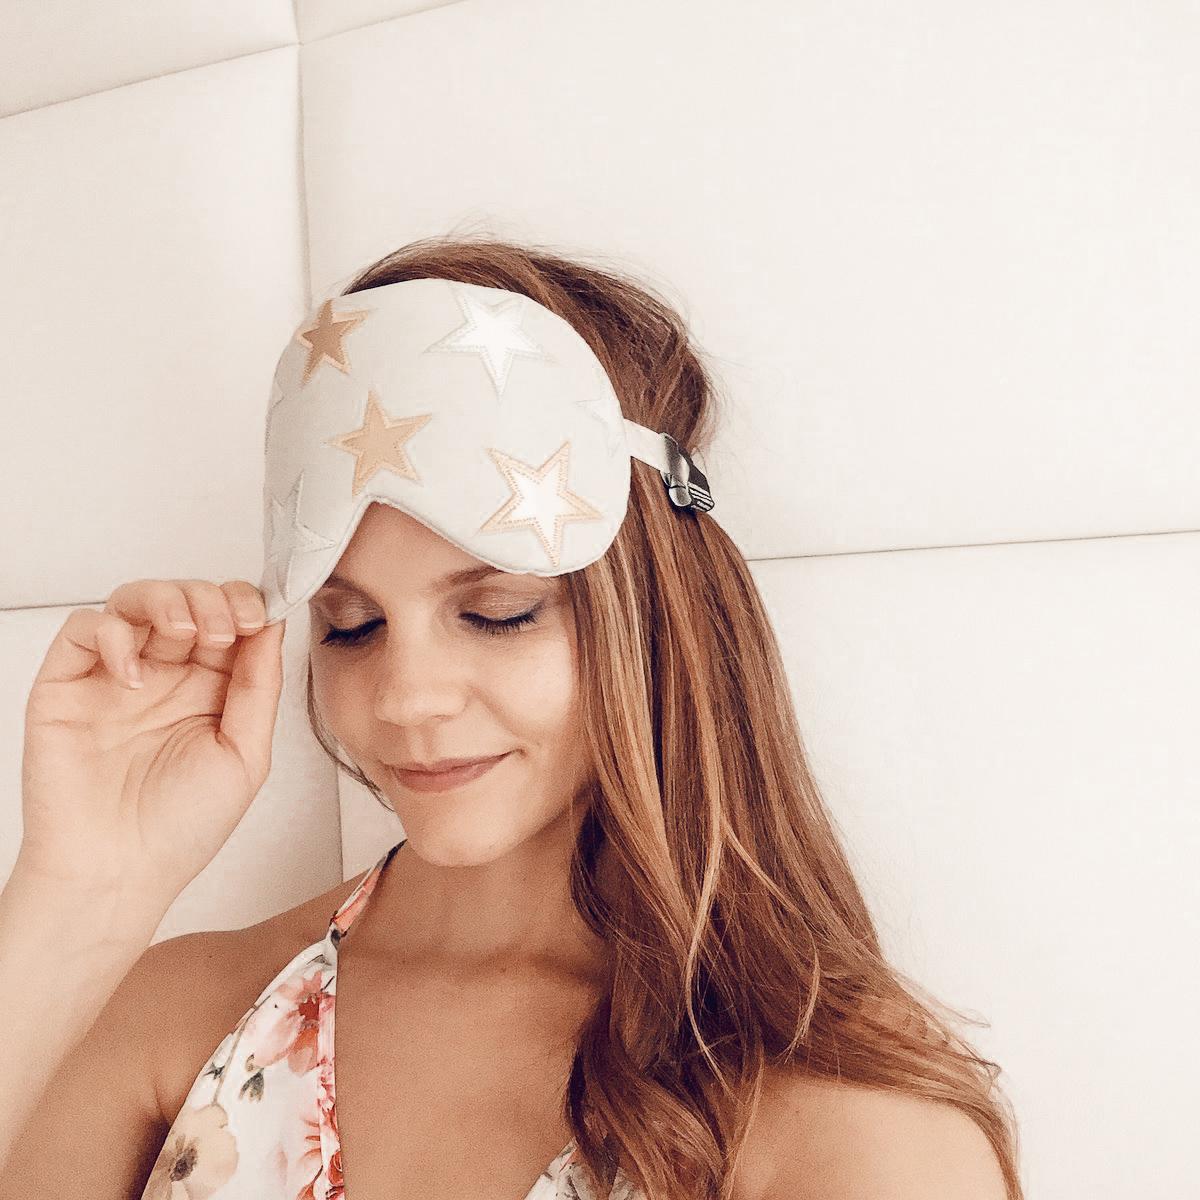 Beauty Sleep Routine